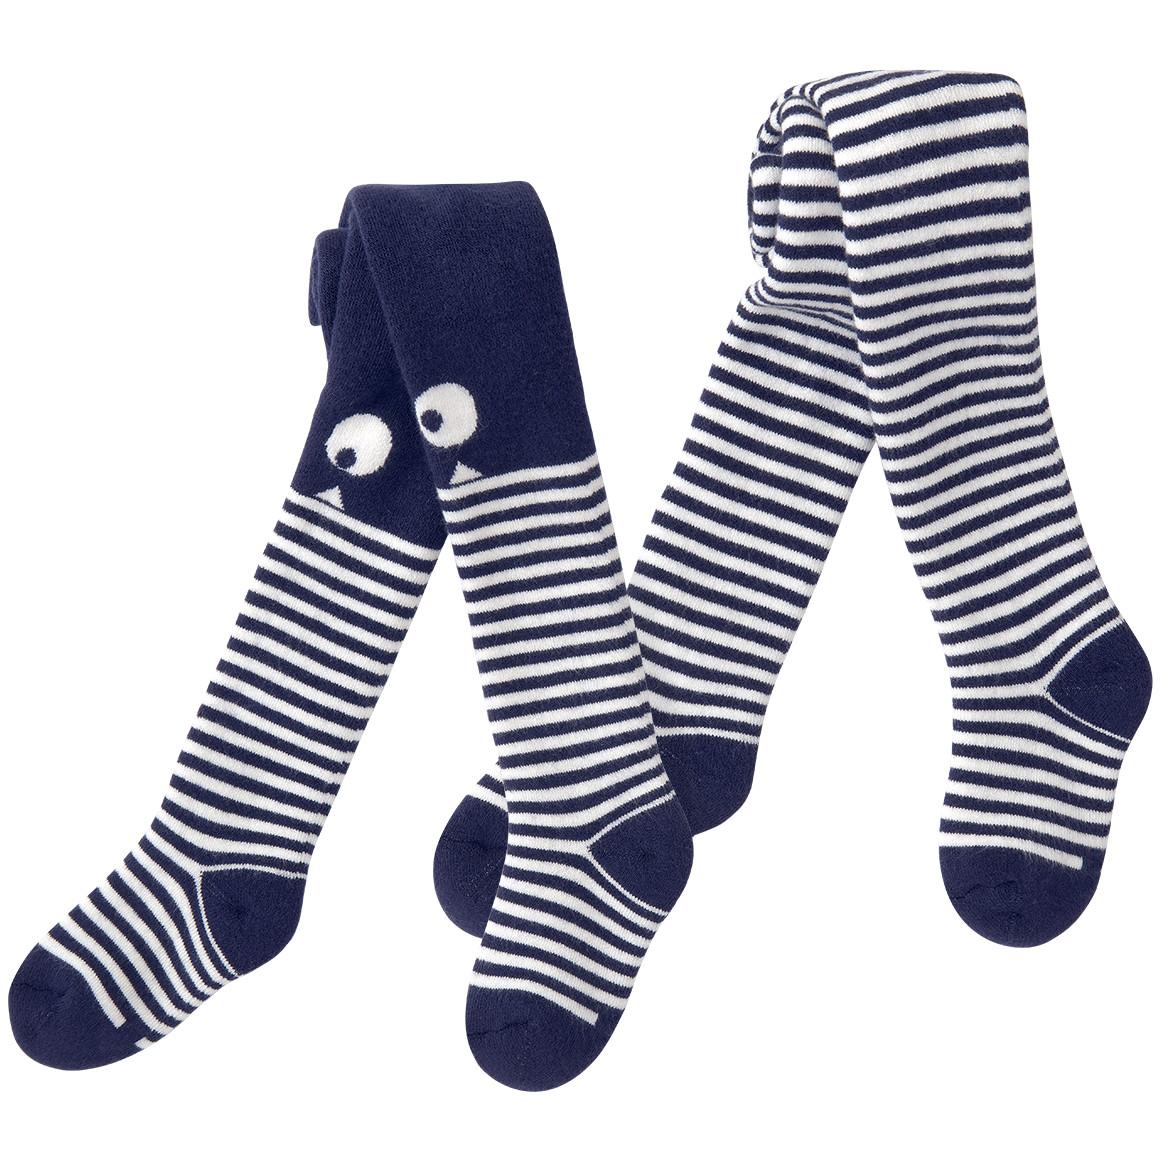 2 Baby Strumpfhosen mit lustigem Motiv